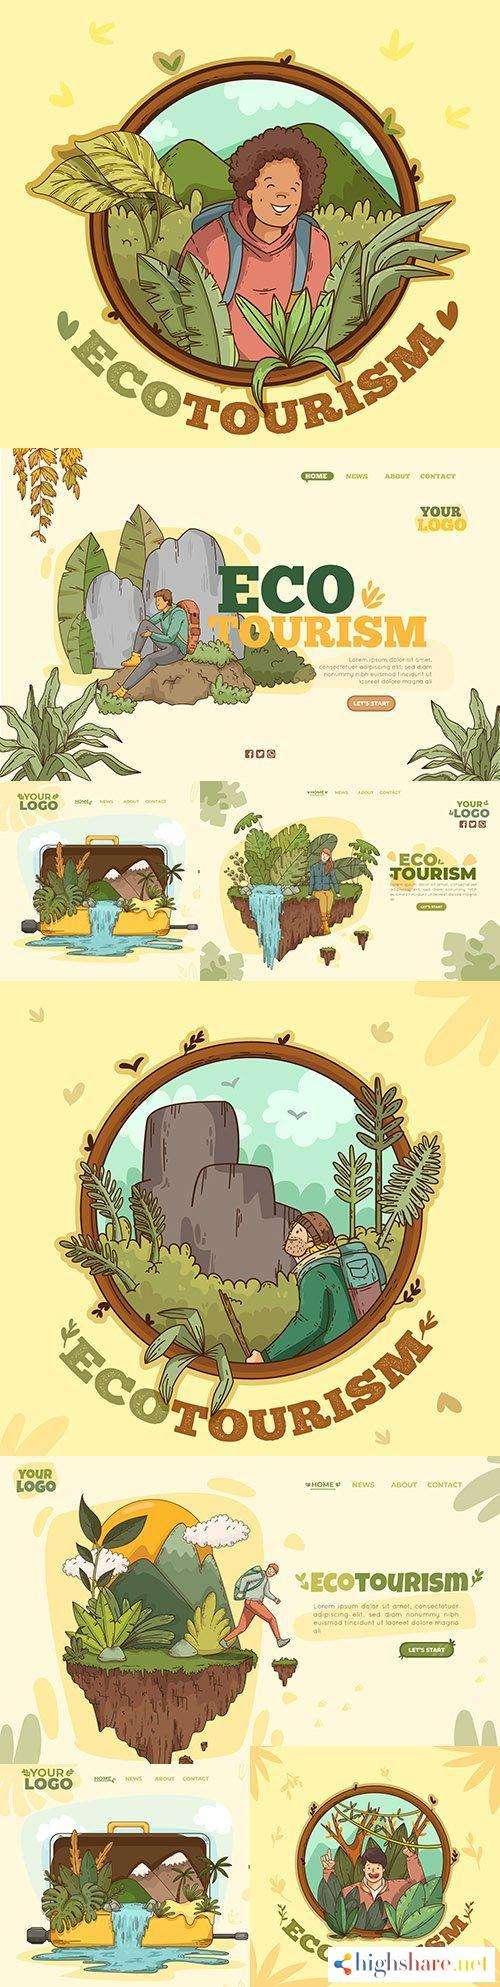 eco tourism template landing page design 5f452ebcb6e6e - Eco tourism template landing page design